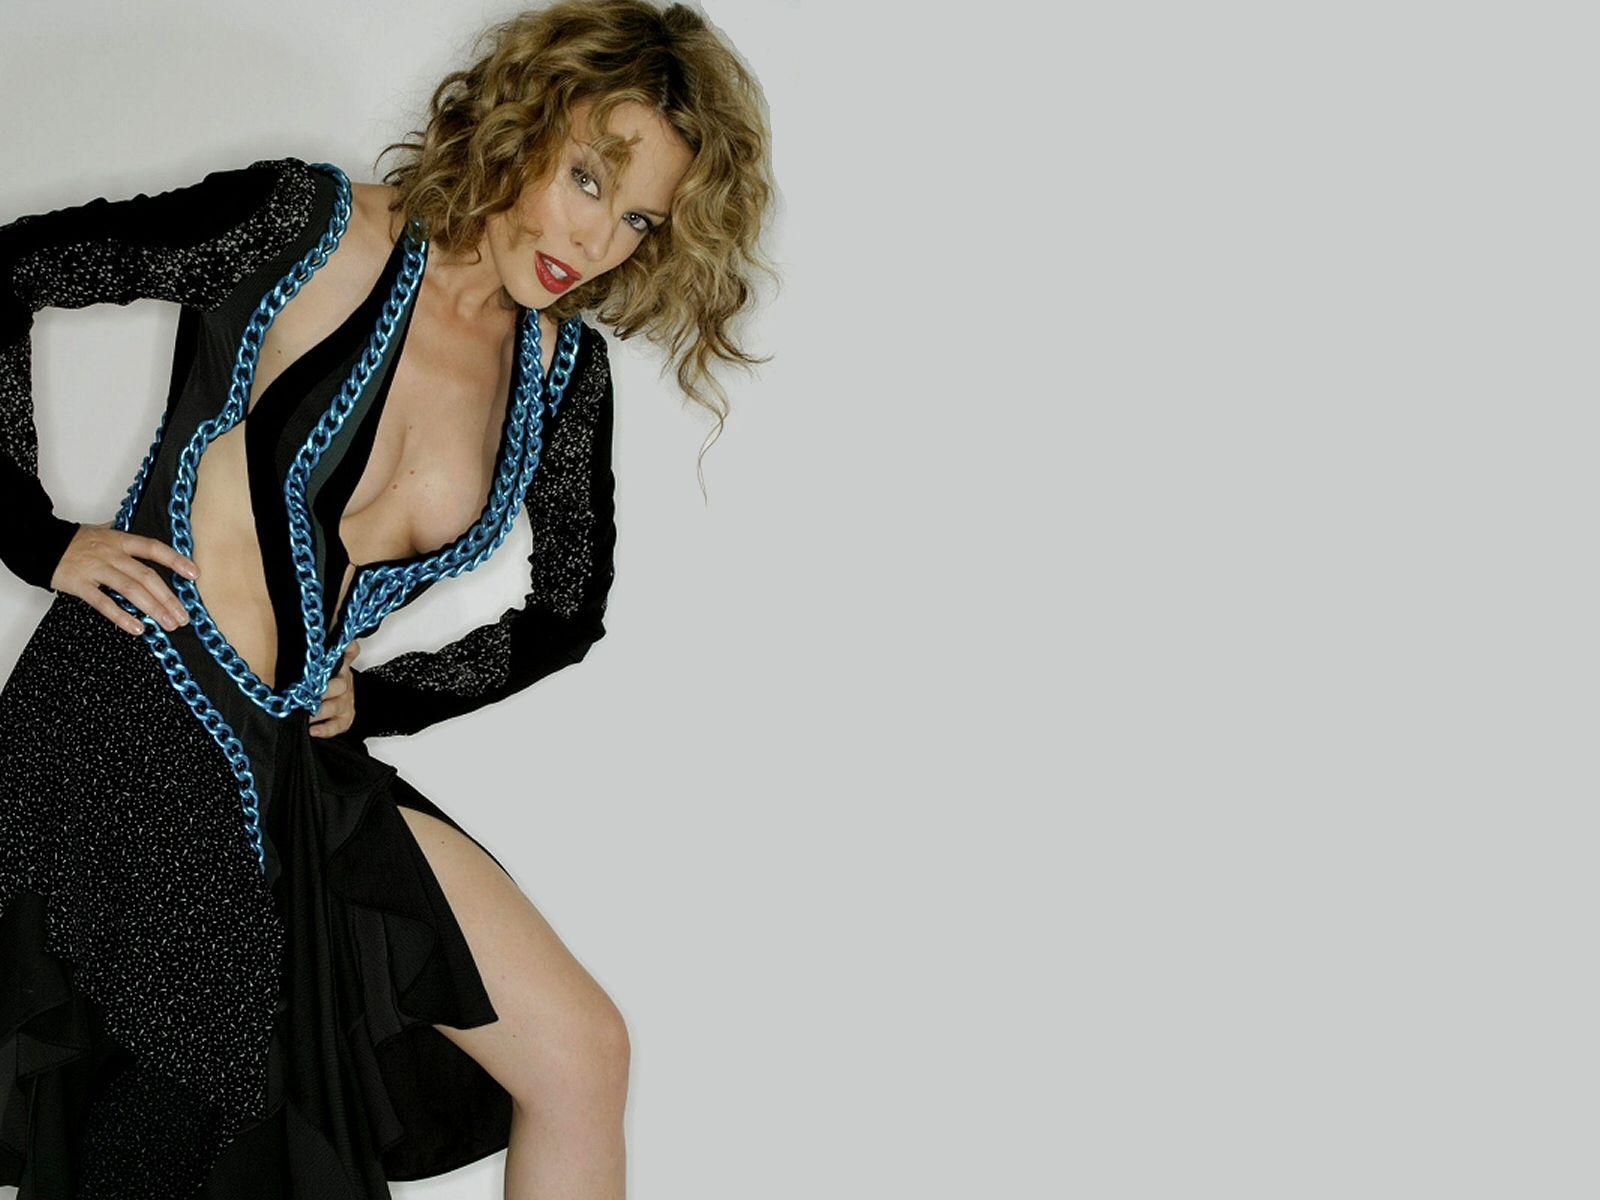 29304_Kylie_Minogue_220_123_115lo.jpg